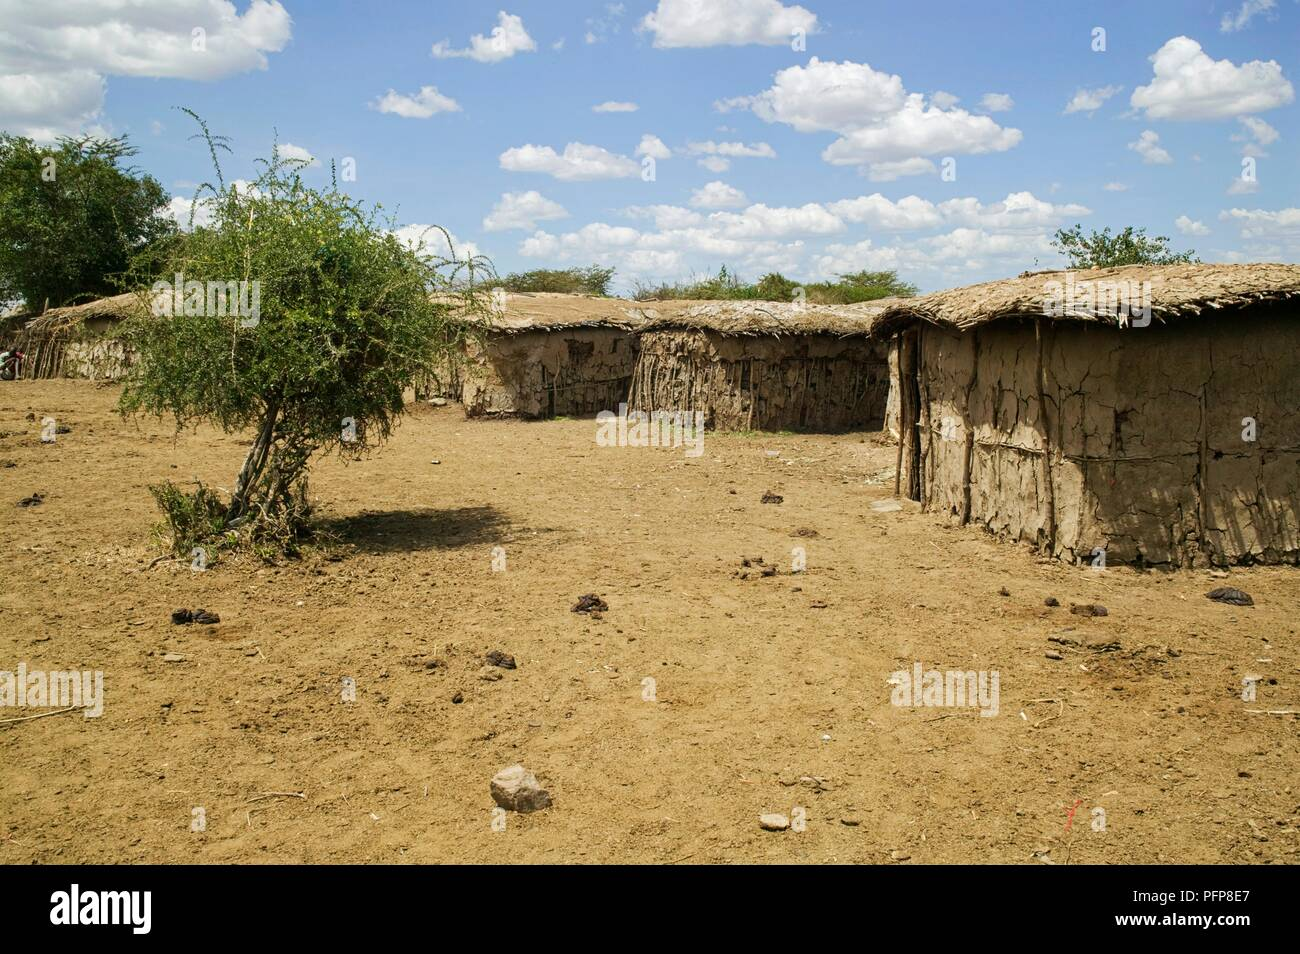 Kenya Olboma Houses In Maasai Village Manyatta On The Edge Of. Kenya Olboma Houses In Maasai Village Manyatta On The Edge Of Masai Mara National Reserve. Wiring. Diagram Of A House A Manyatta At Scoala.co